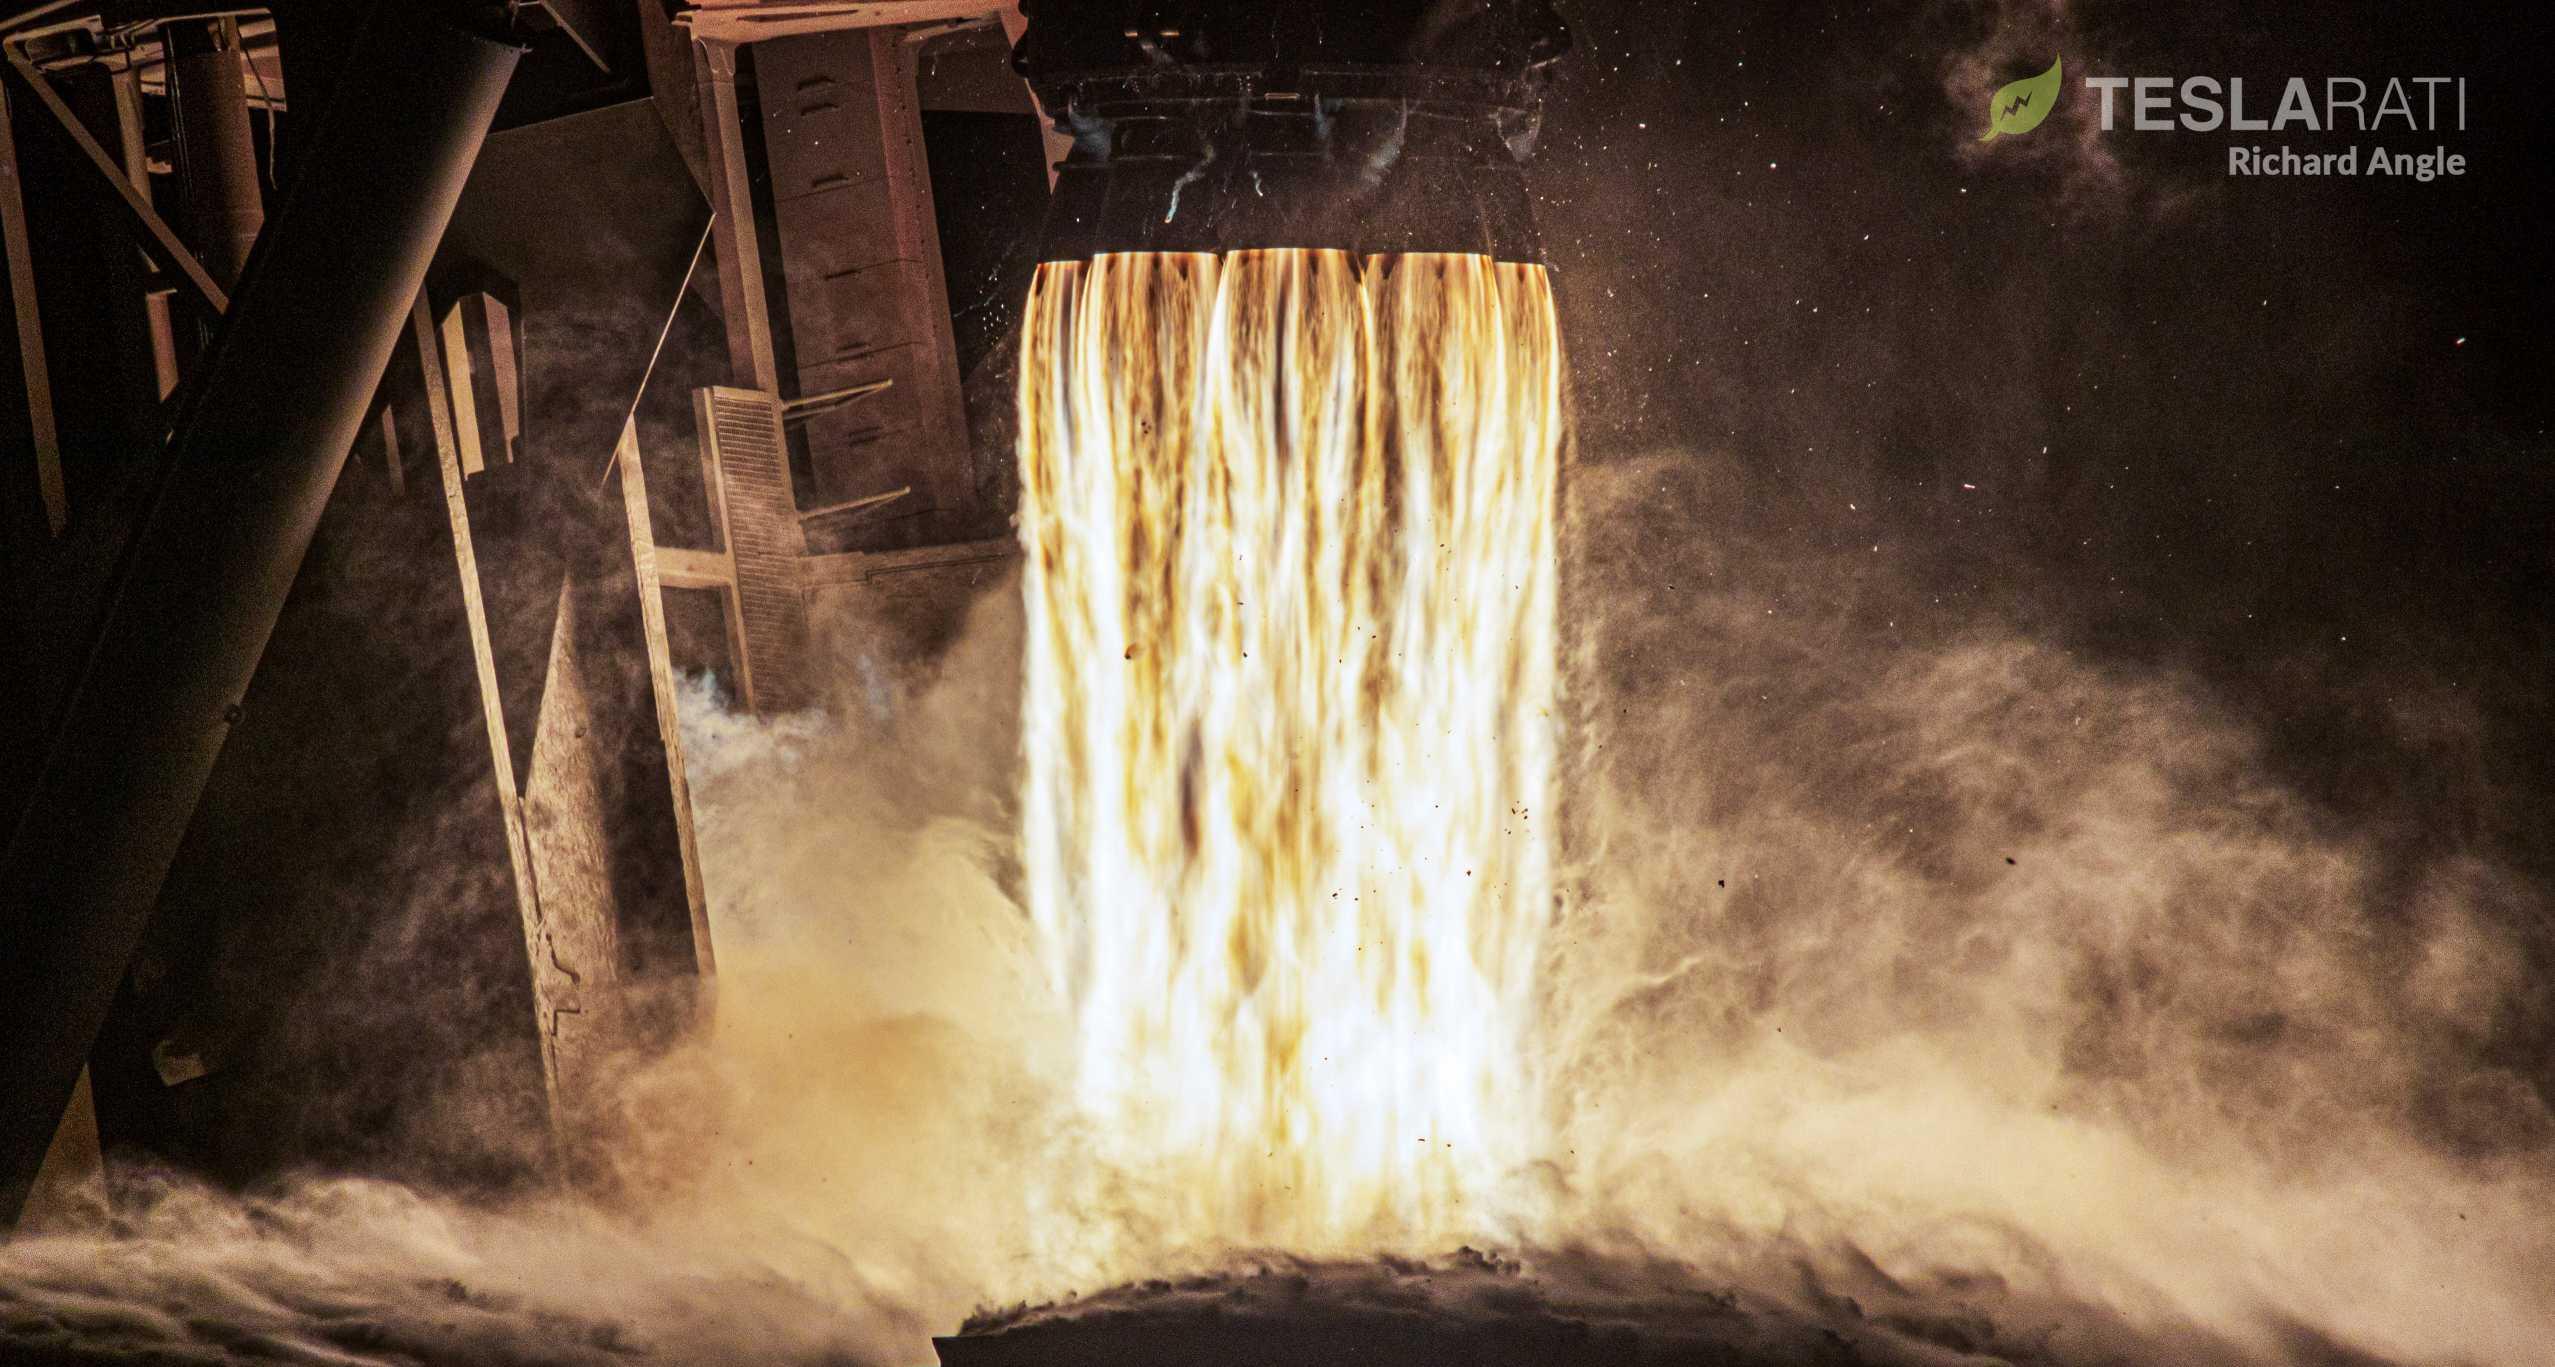 Starlink-8 Falcon 9 B1049 LC-40 060320 (Richard Angle) launch 4 crop (c)